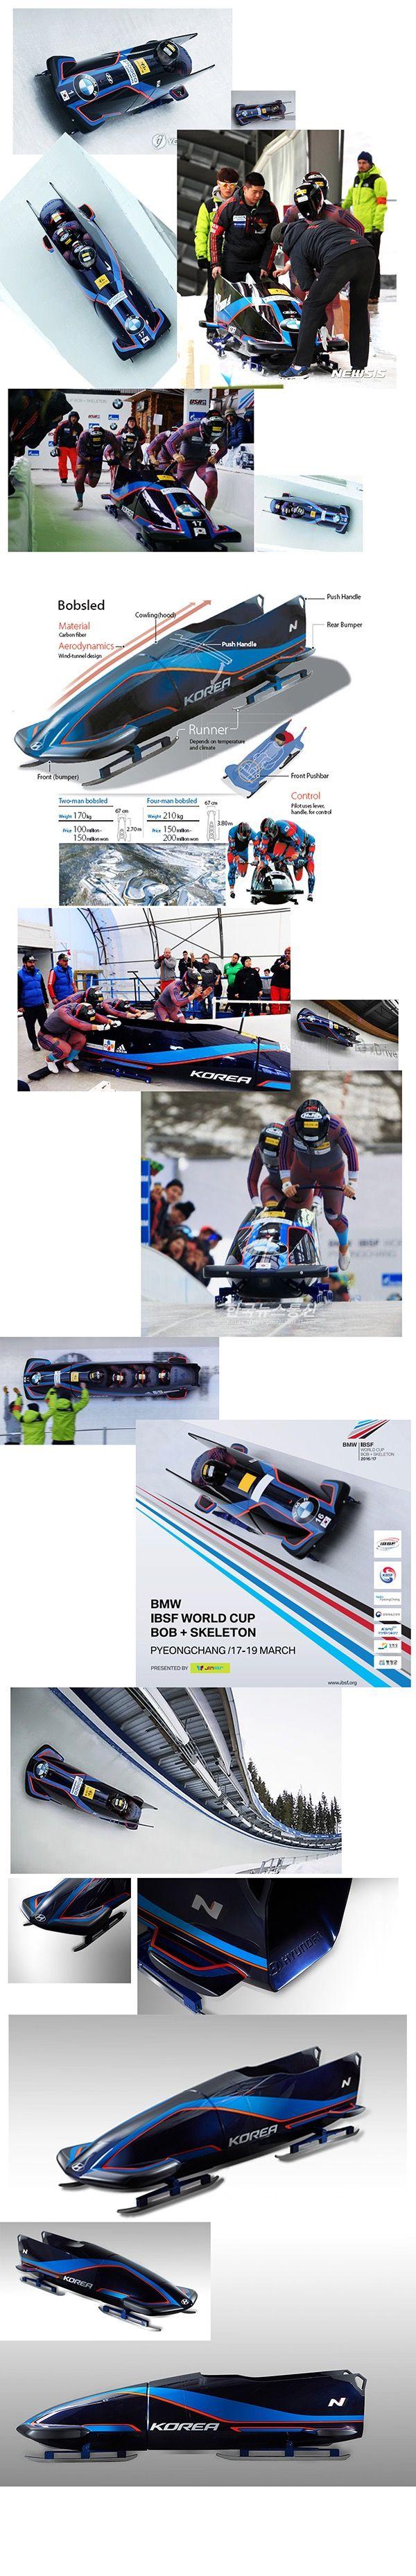 Korea team bobsleigh design